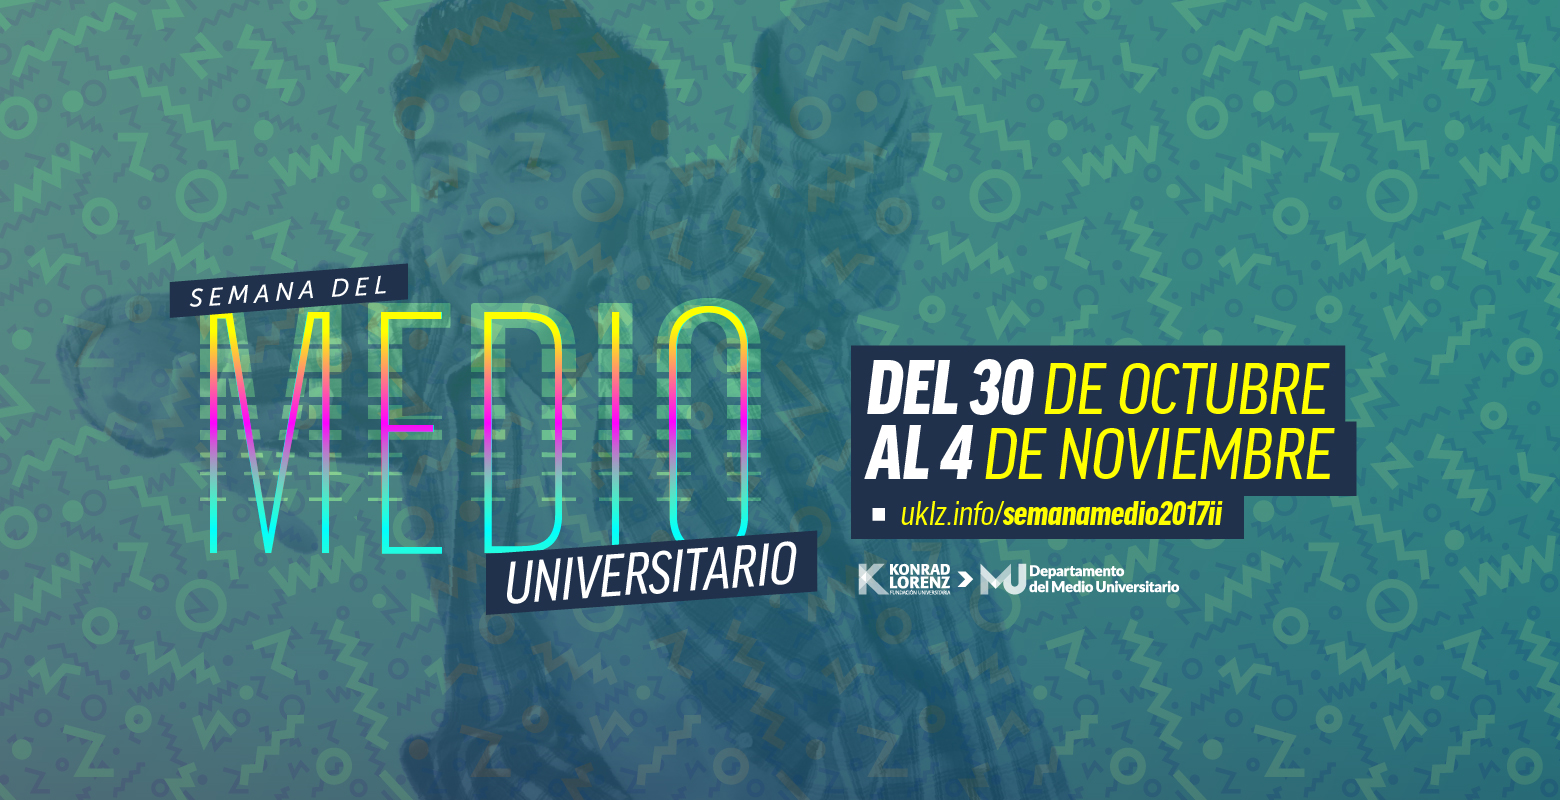 Semana del Medio Universitario 2017-II